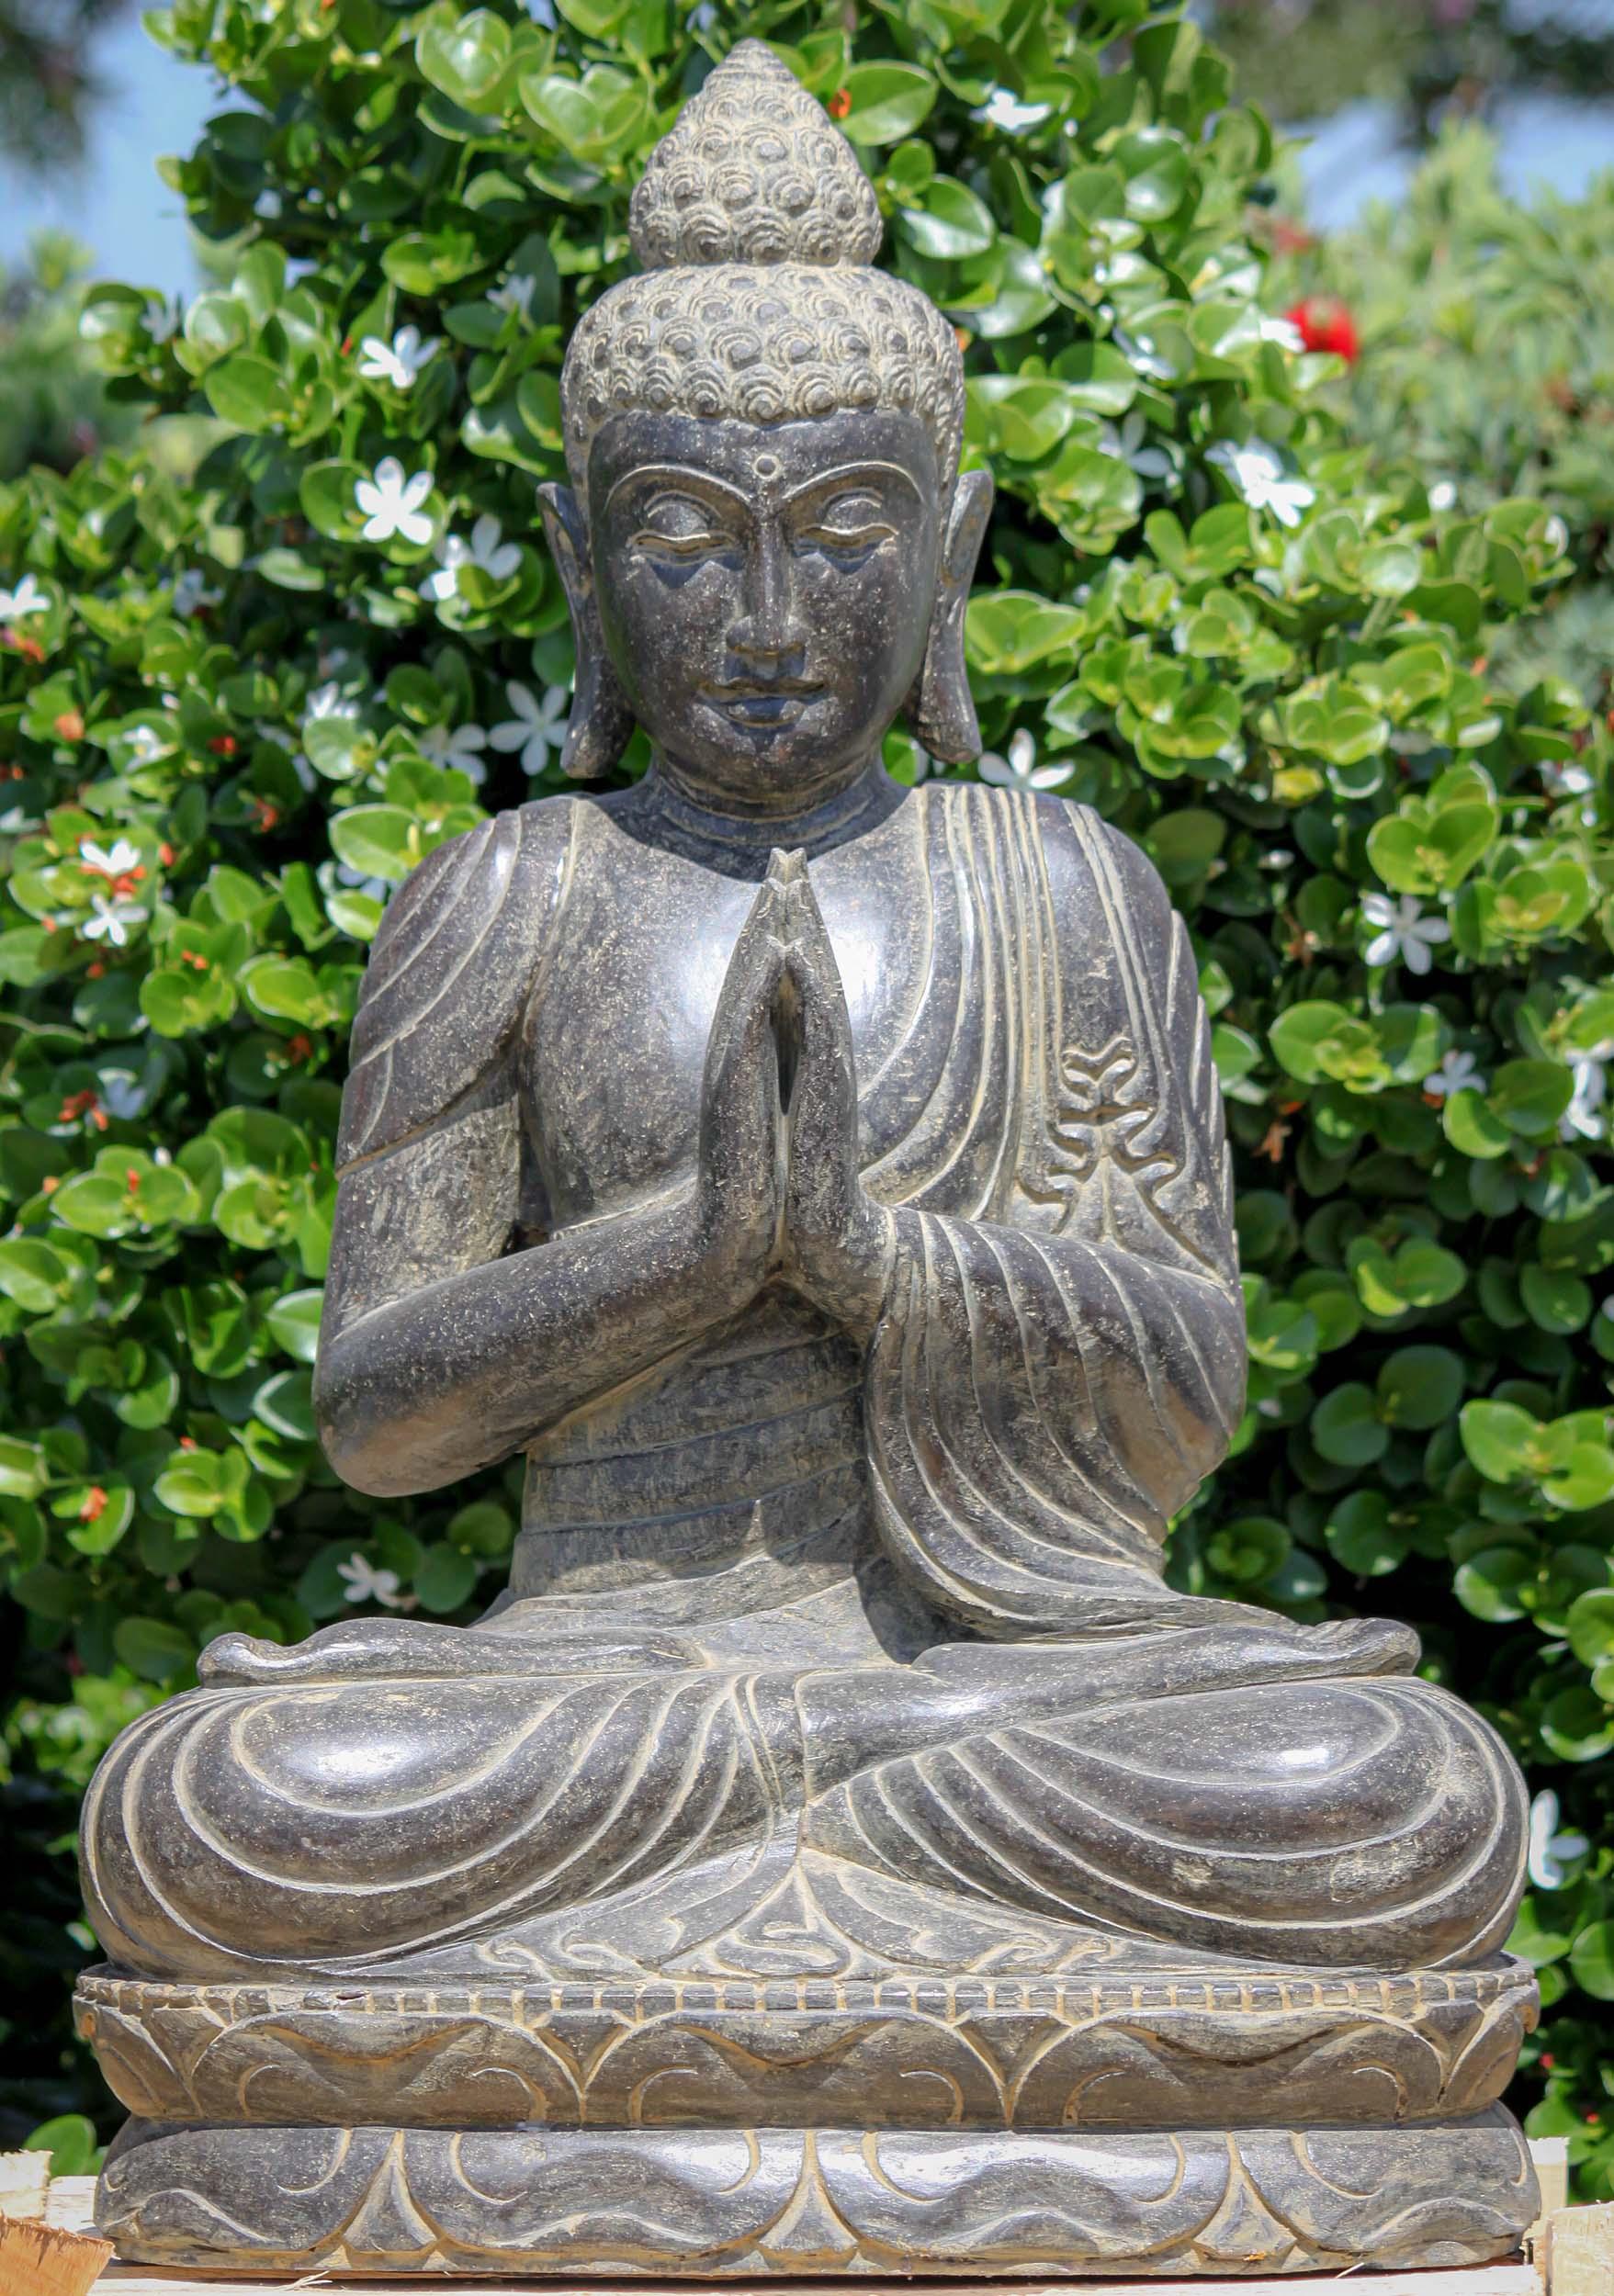 Sold Stone Namaste Buddha Garden Sculpture 32 124ls719 Hindu Gods Buddha Statues